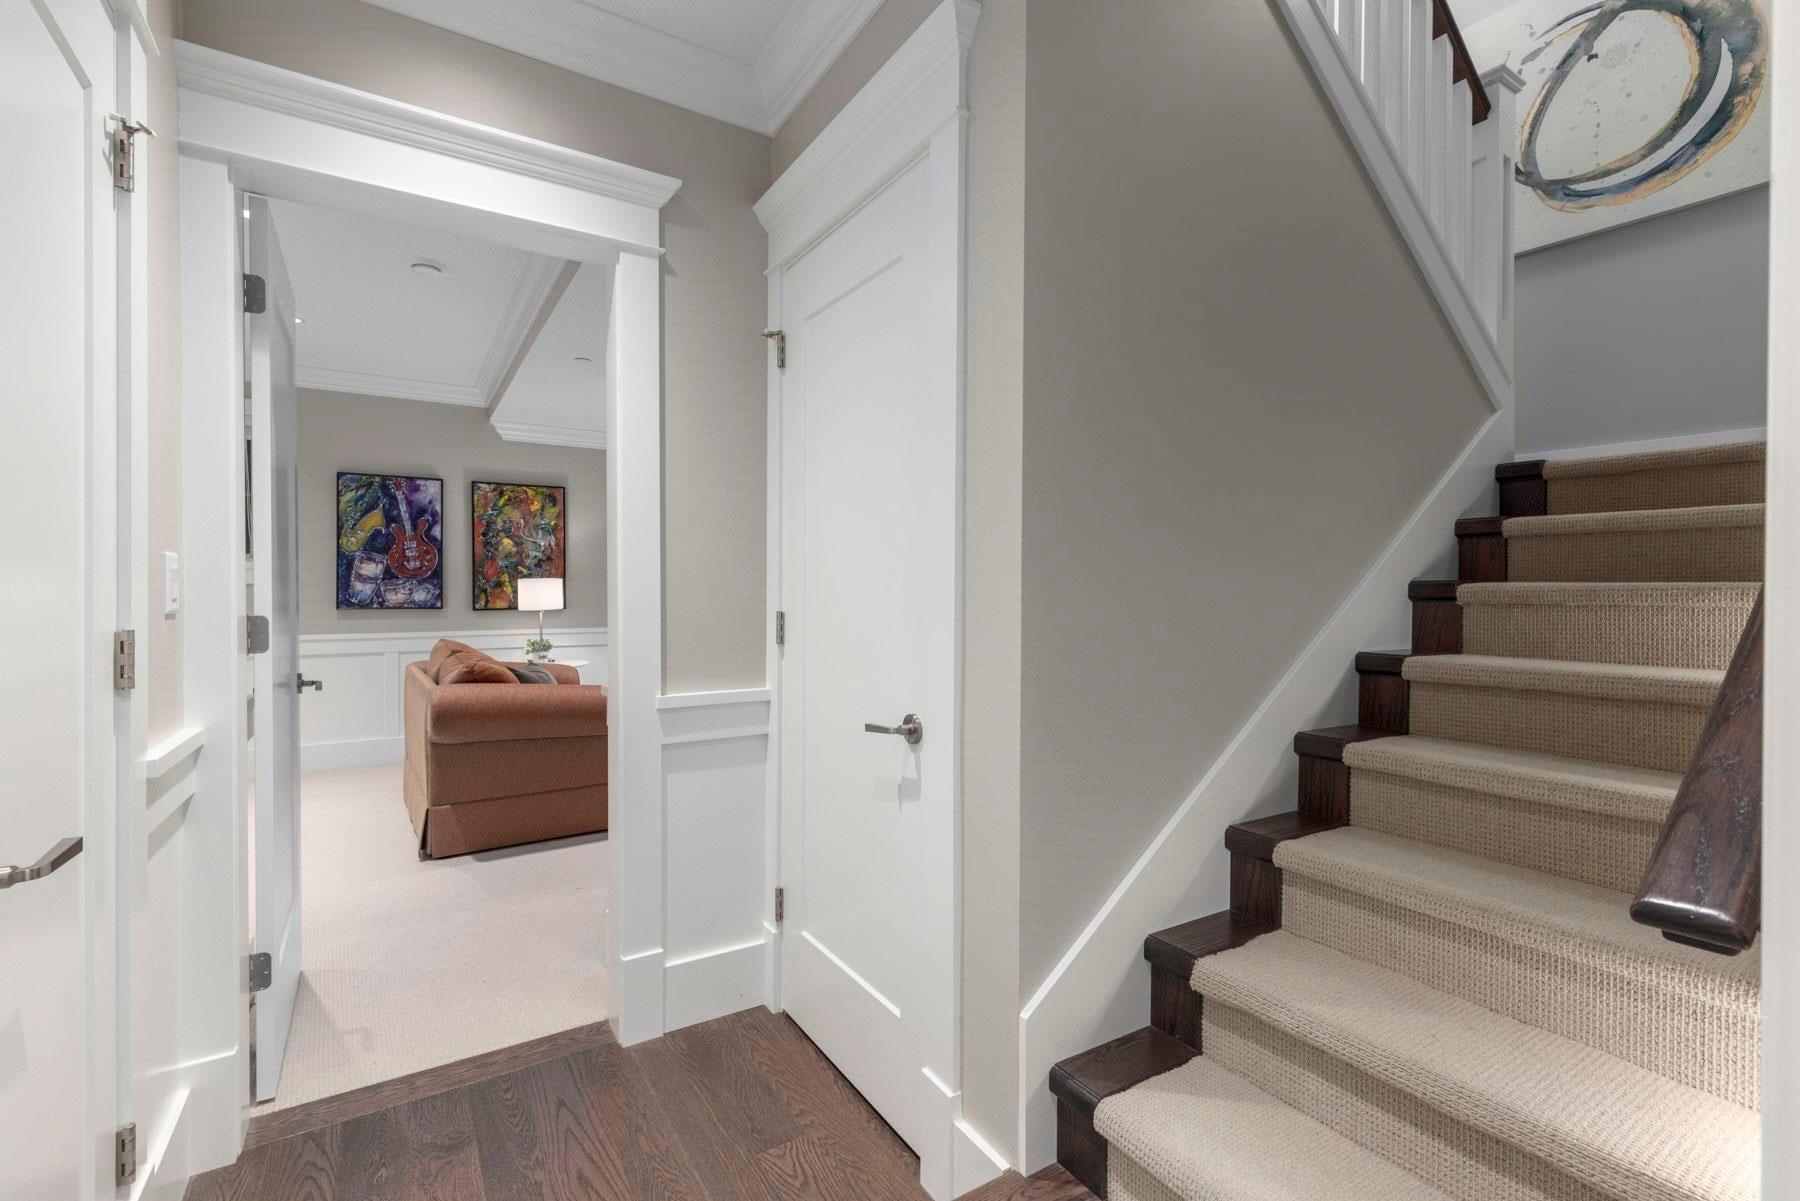 1421 GORDON AVENUE - Ambleside House/Single Family for sale, 3 Bedrooms (R2617756) - #15